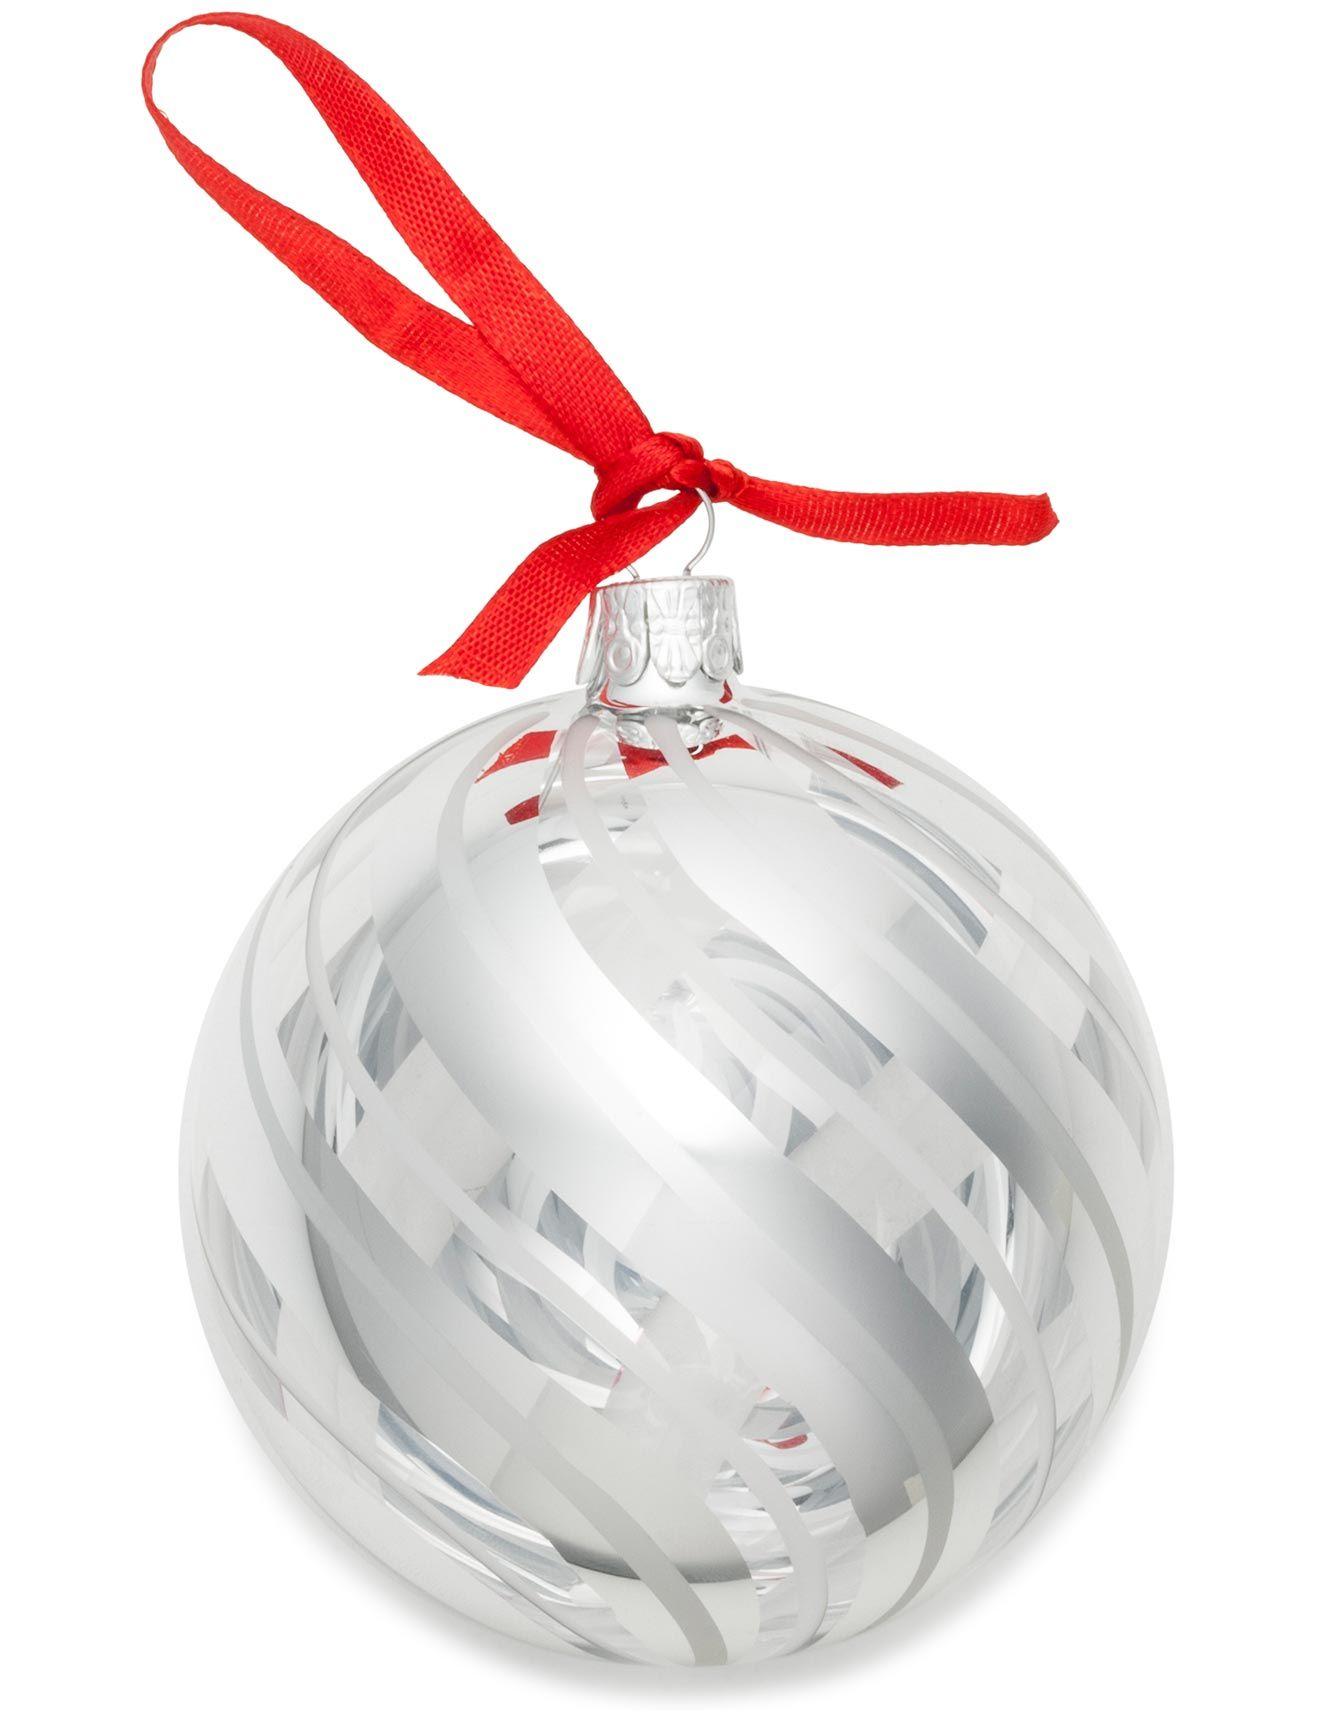 christmas shop candy cane ornament 8cm at david jones store christmas baubles decorations - Candy Cane Christmas Shop